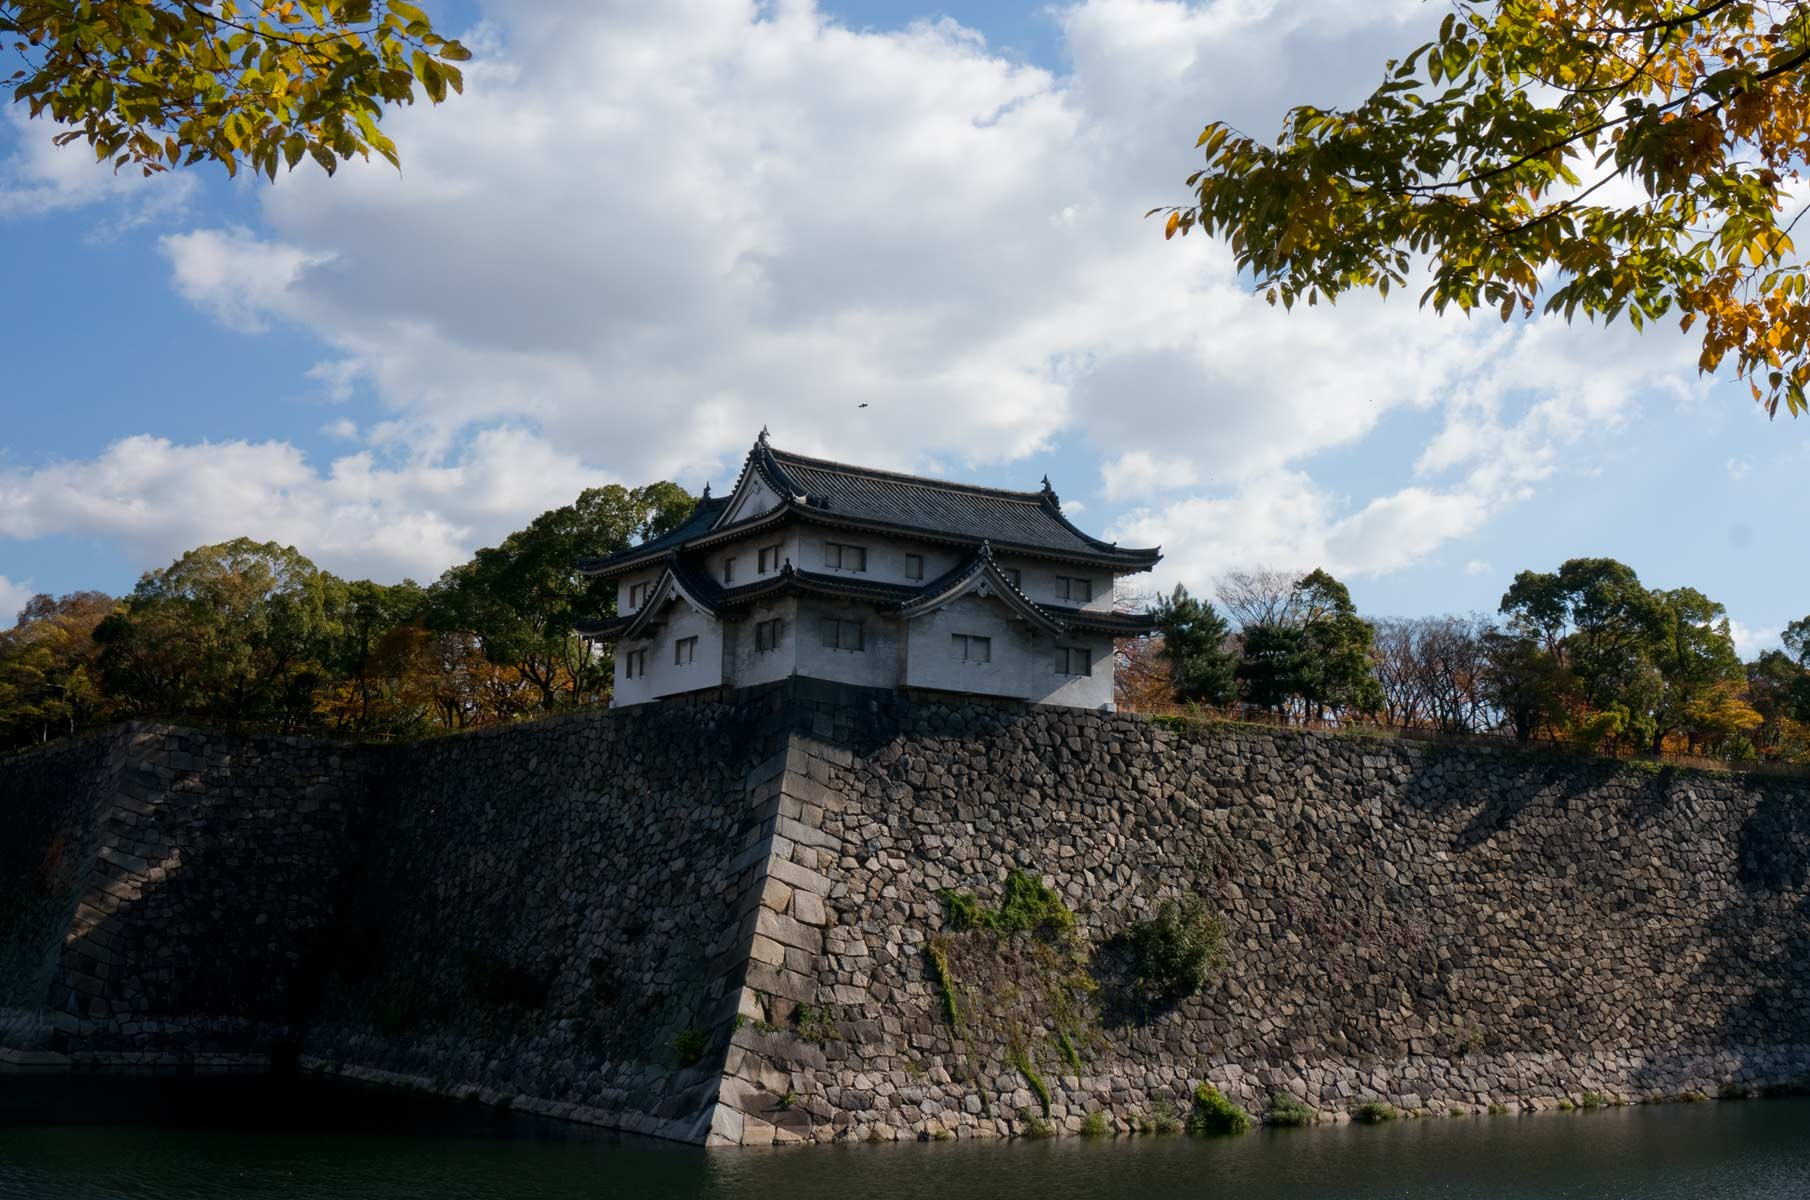 Burggraben der Burg Osaka, Japan